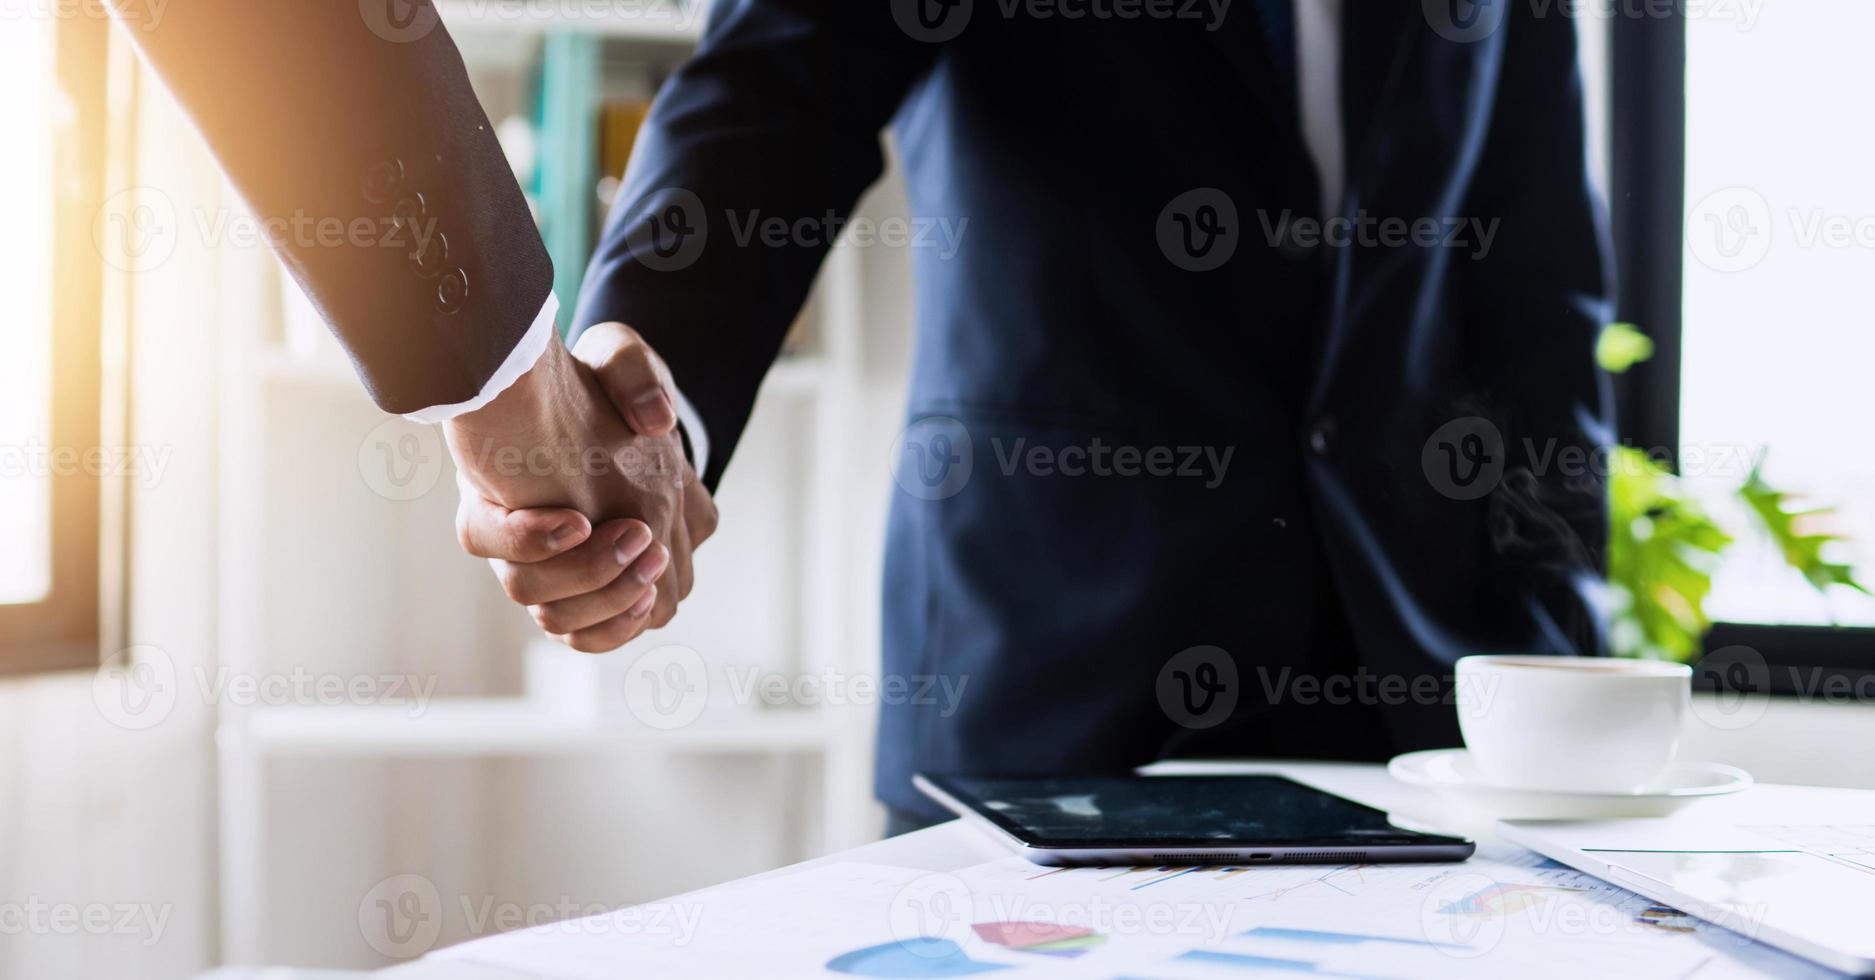 succesvol onderhandelings- en handdrukconcept foto